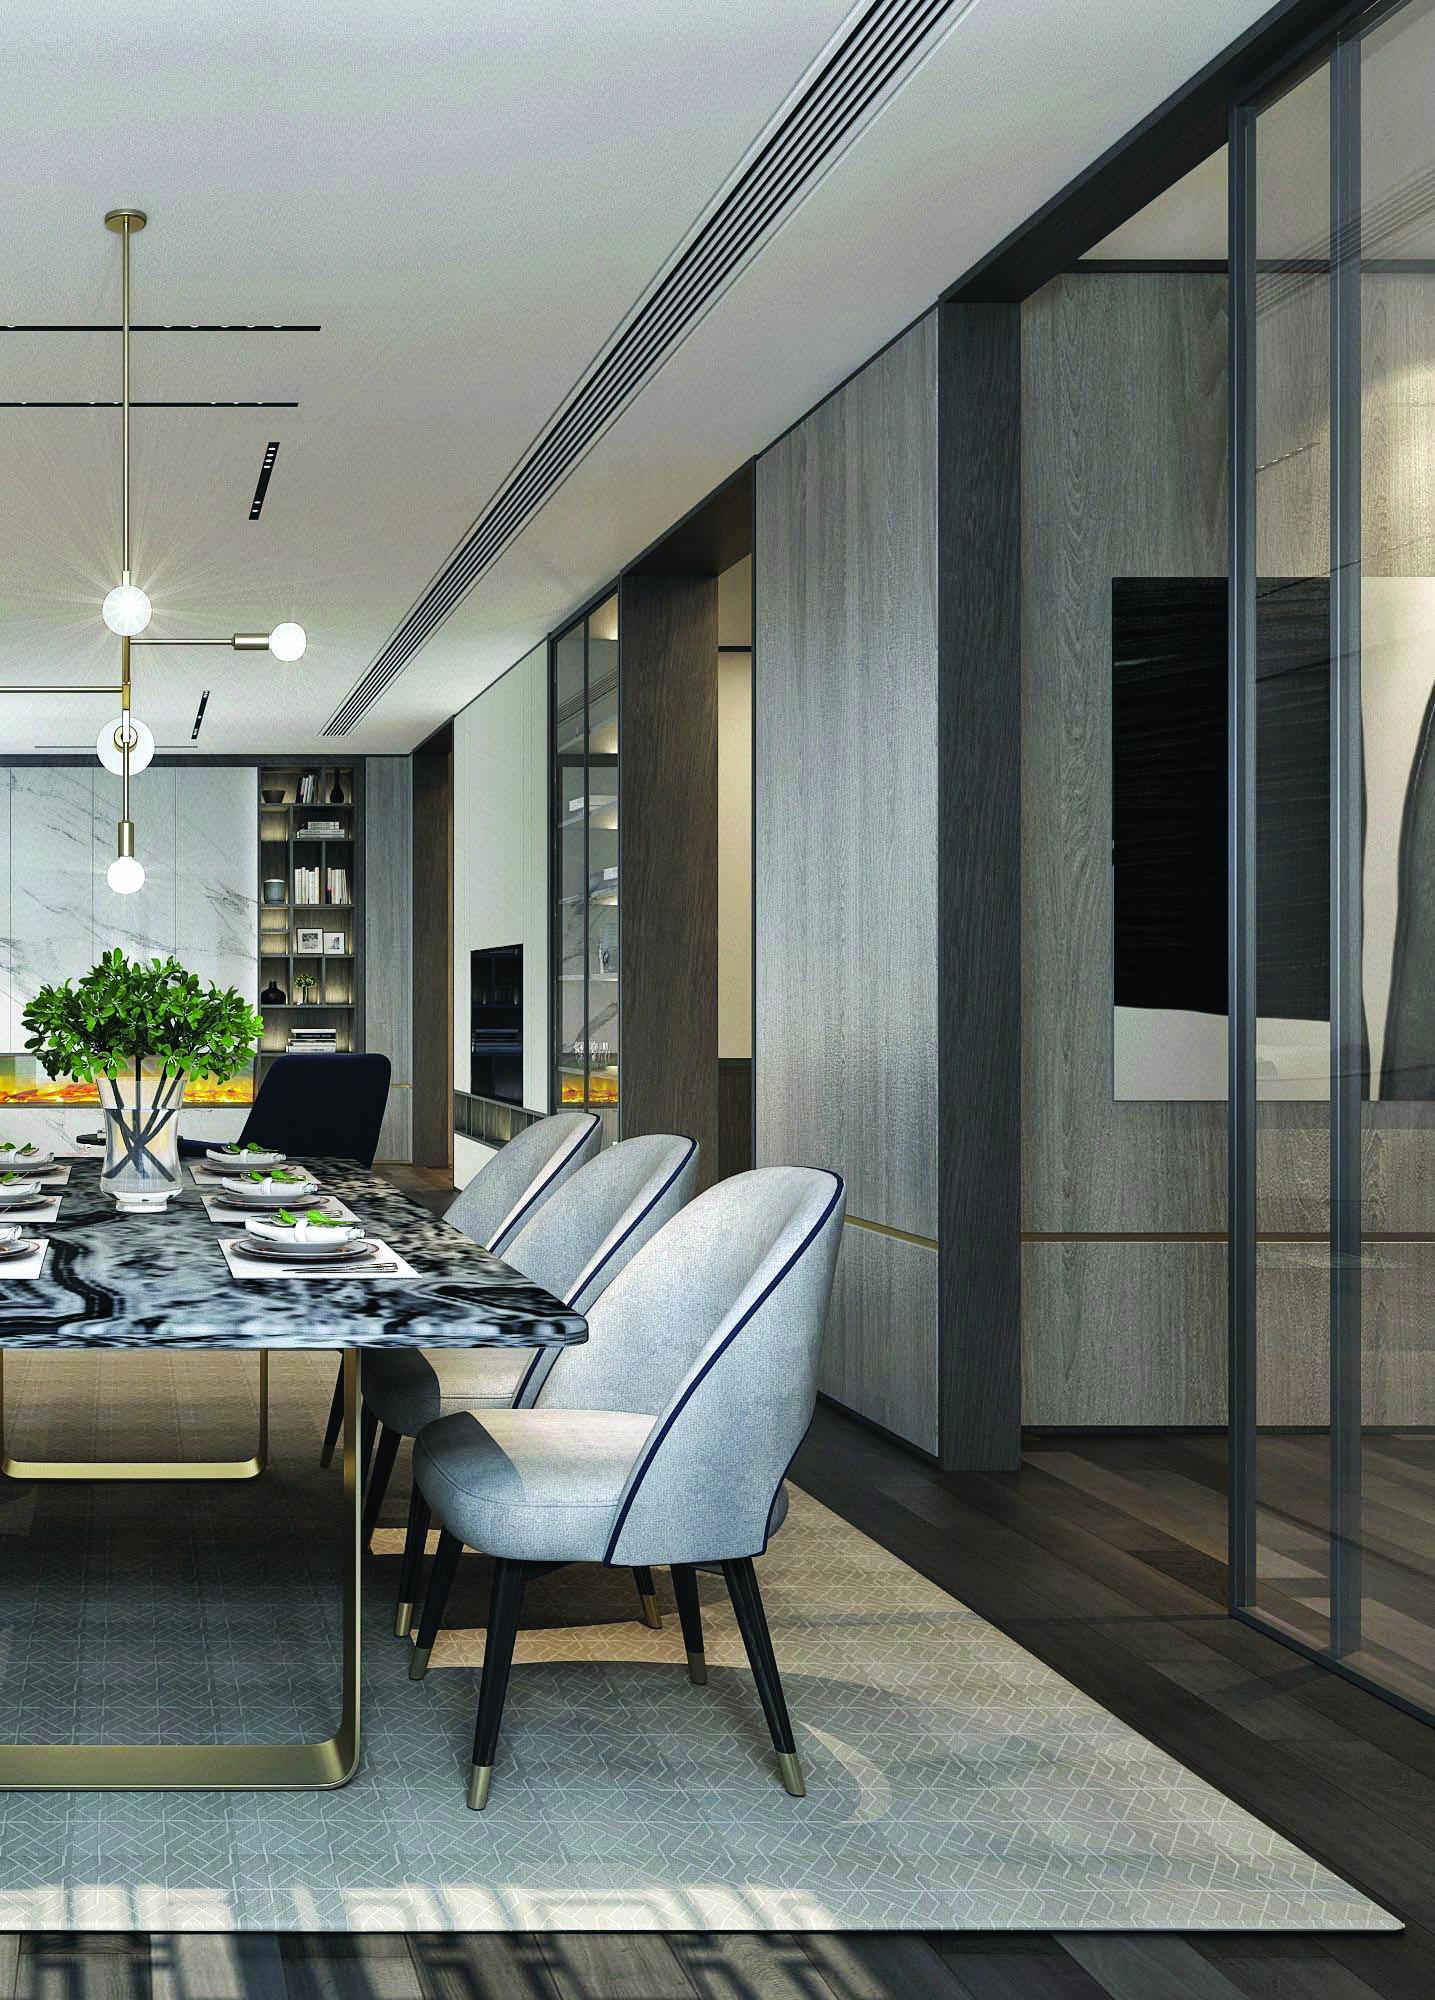 dining room lighting ideas for every single style dining room rh pinterest com